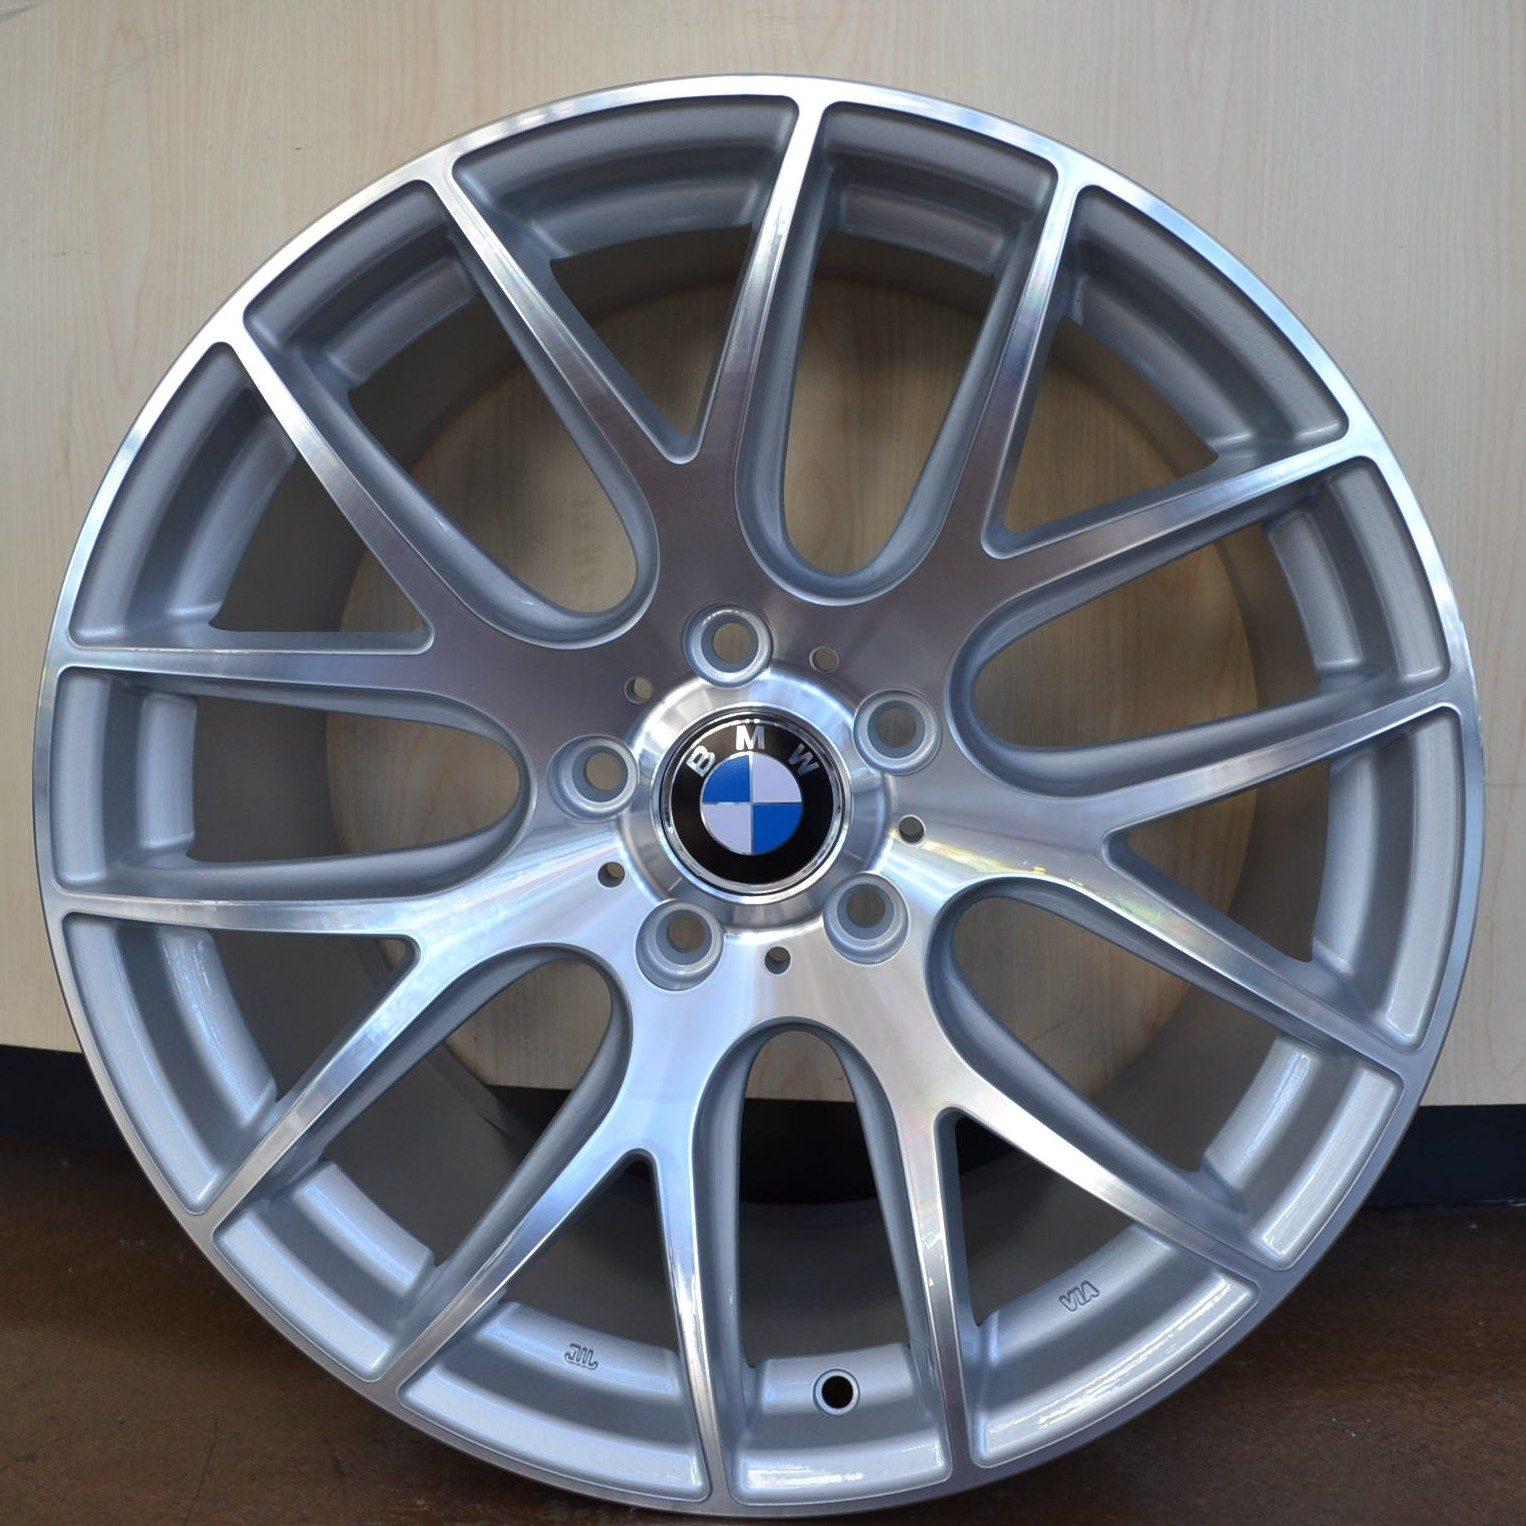 Bmw Wheels Rim 325i 325xi 325ci E46 E90 M3 Hyper Silver Machine Face 18 Quot